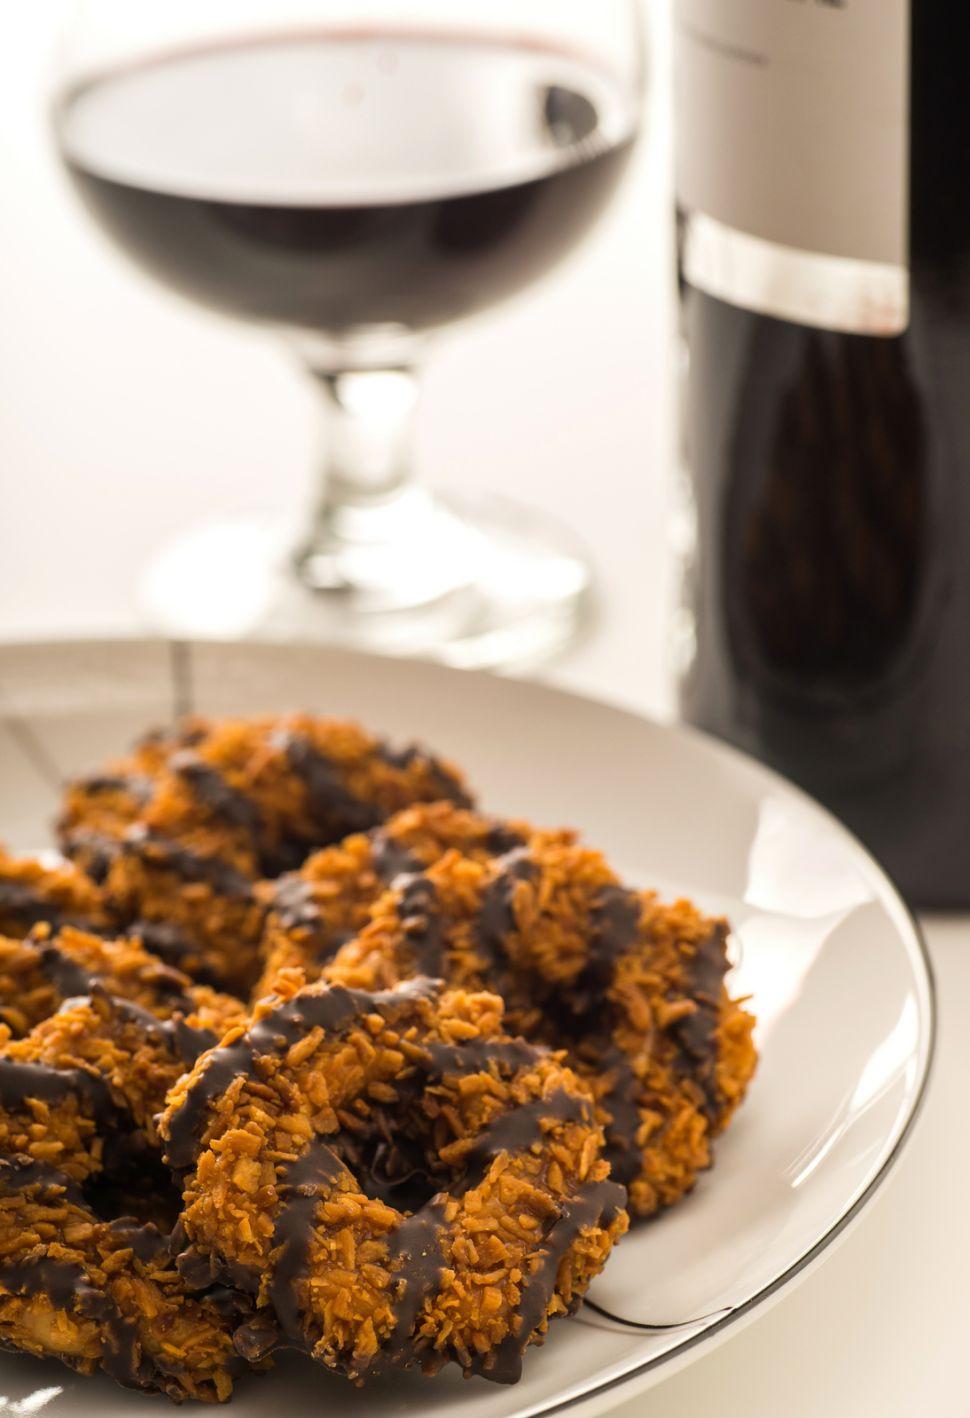 The Best Beer & Wine Pairings for Girl Scout Cookies